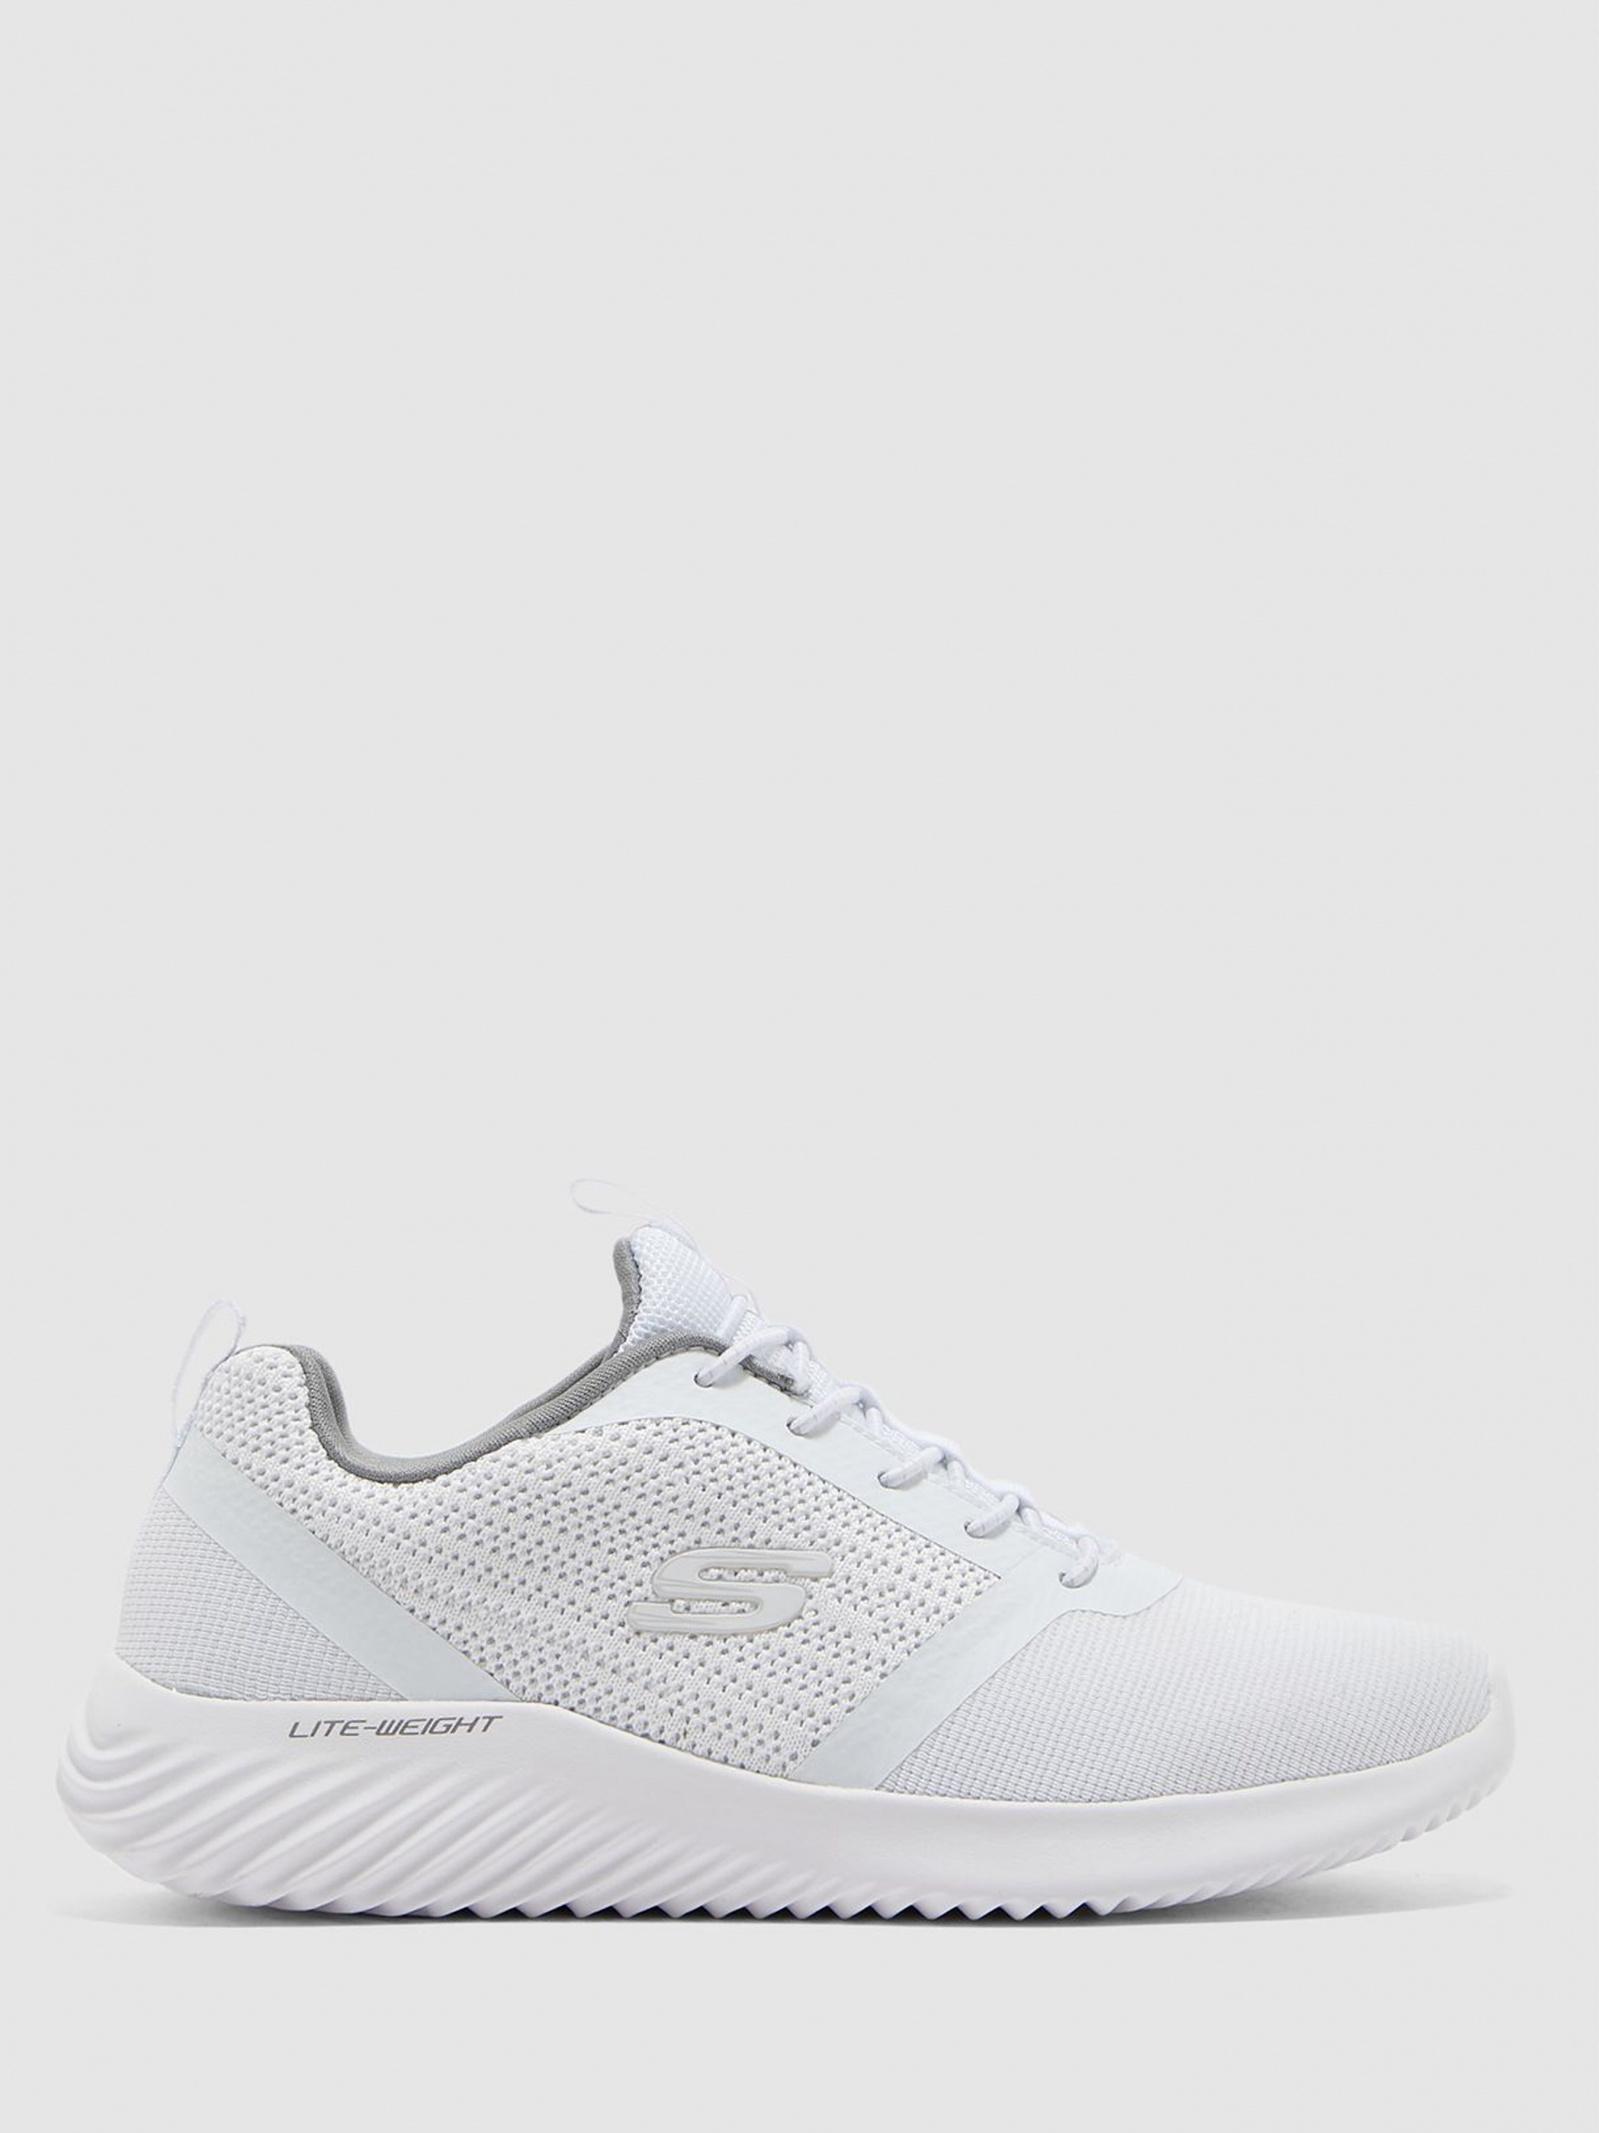 Кросівки  для чоловіків Skechers Skechers Mens Sport 52504 WHT ціна, 2017